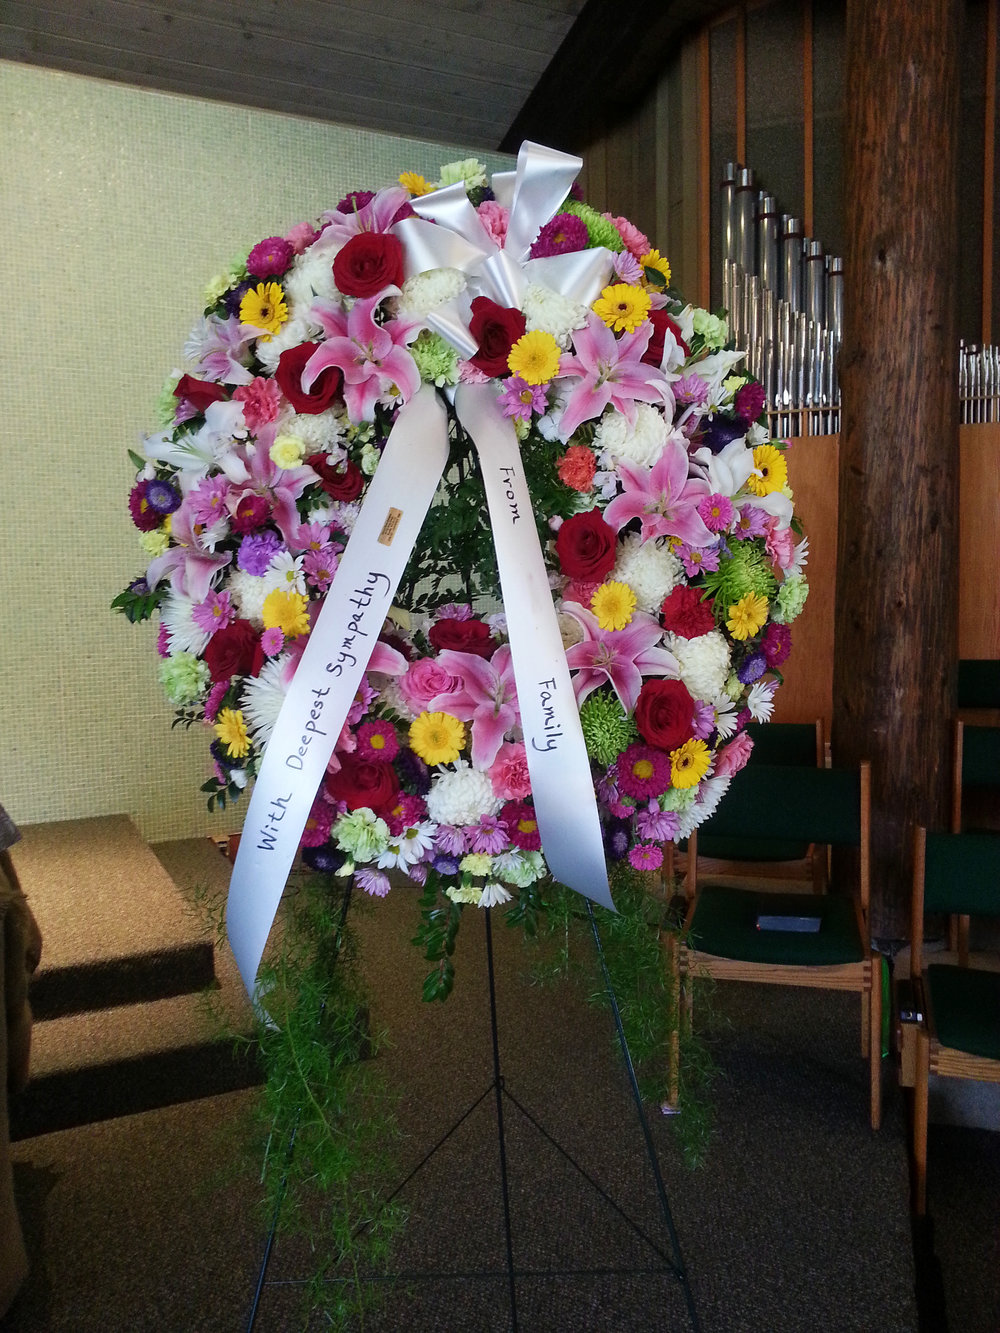 Tribute (W-42)